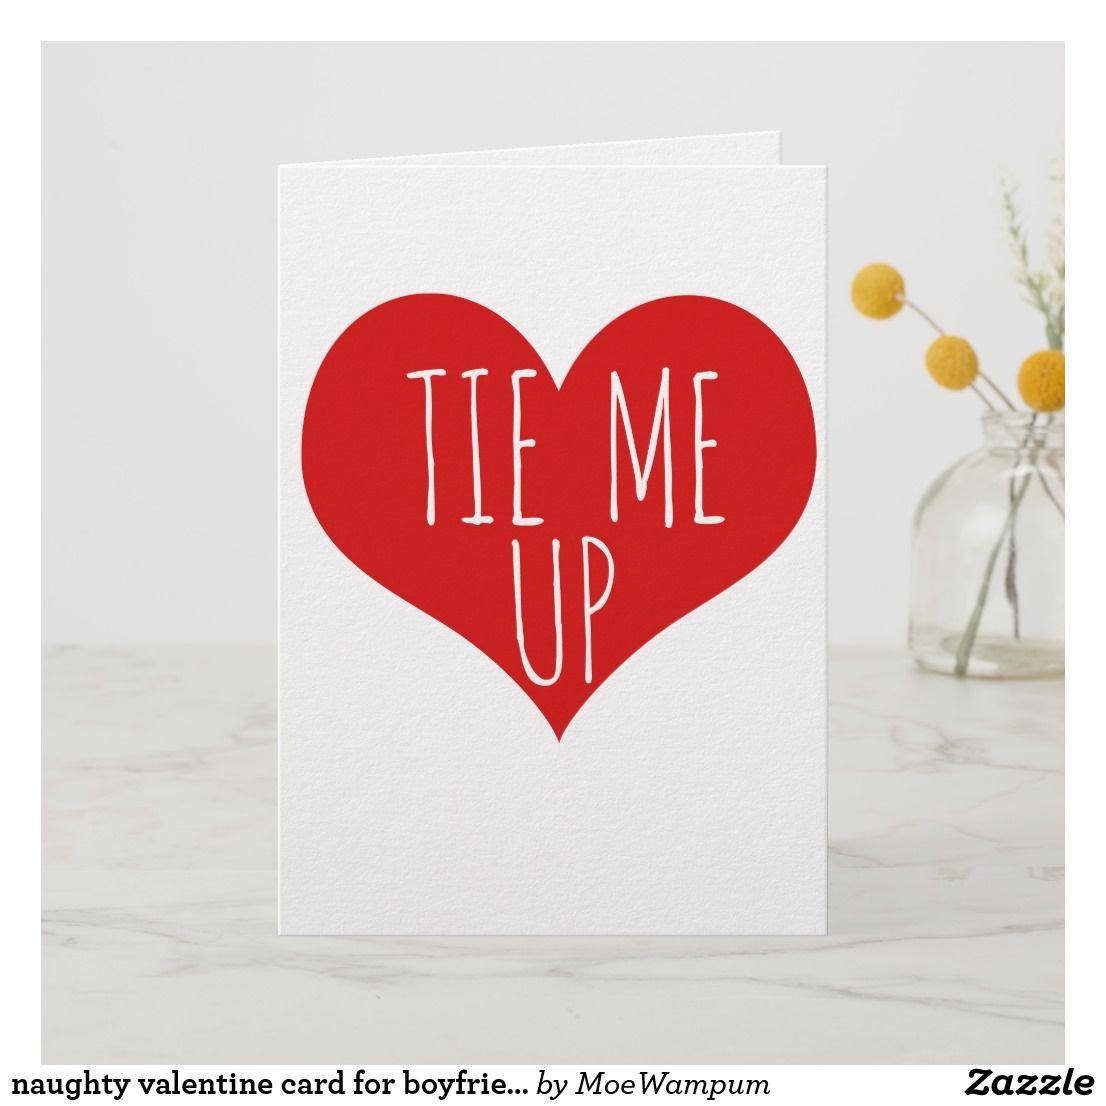 naughty valentine card for boyfriend TIE ME UP